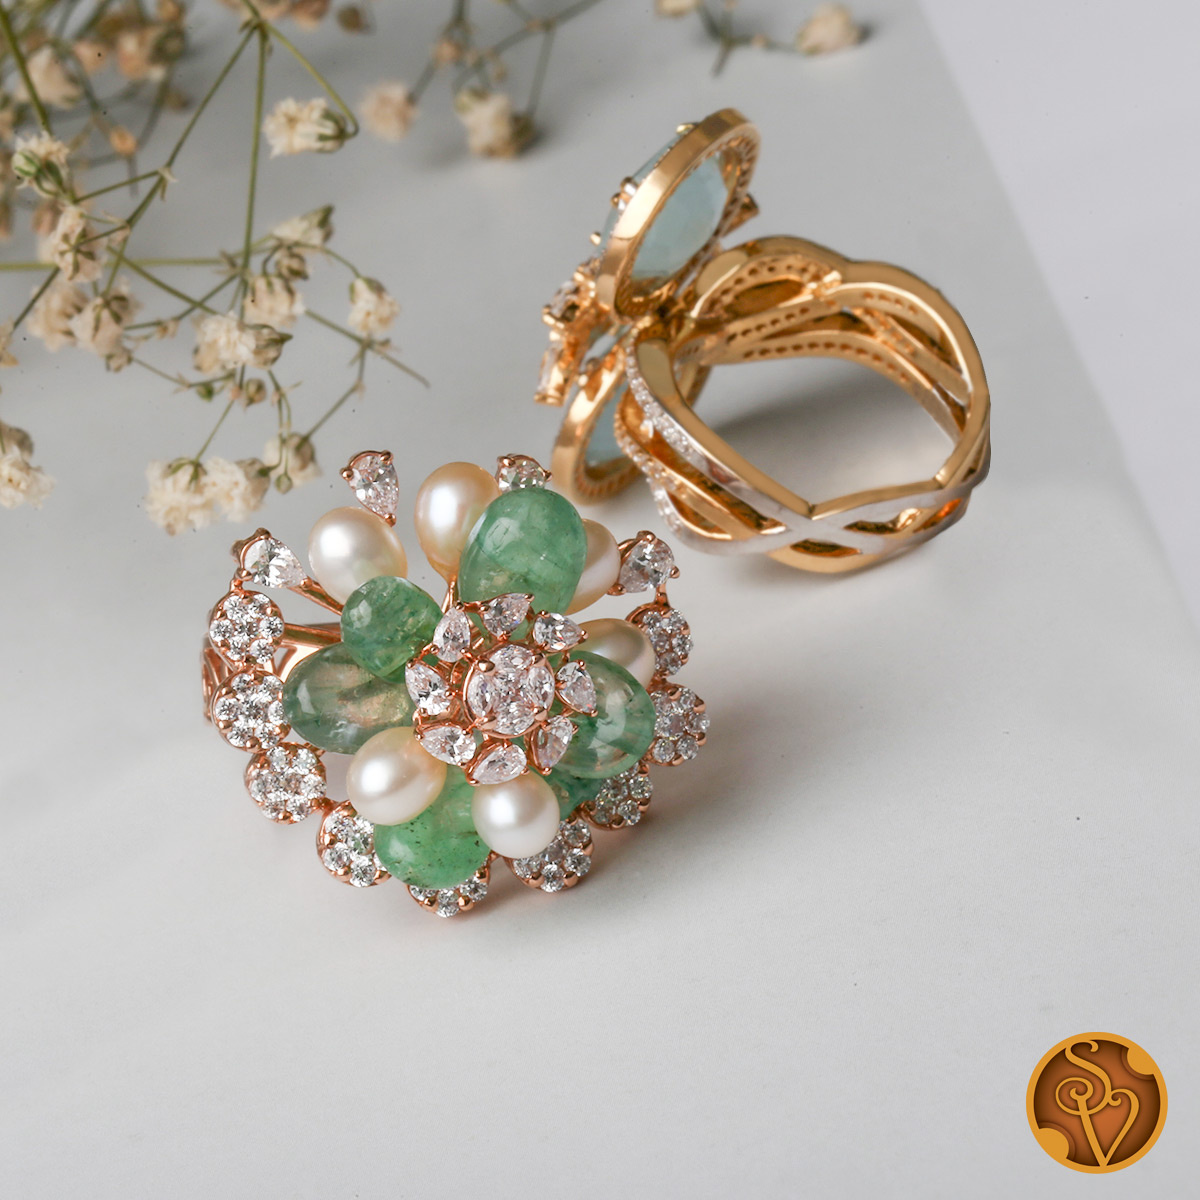 Charming Swarovski Ring